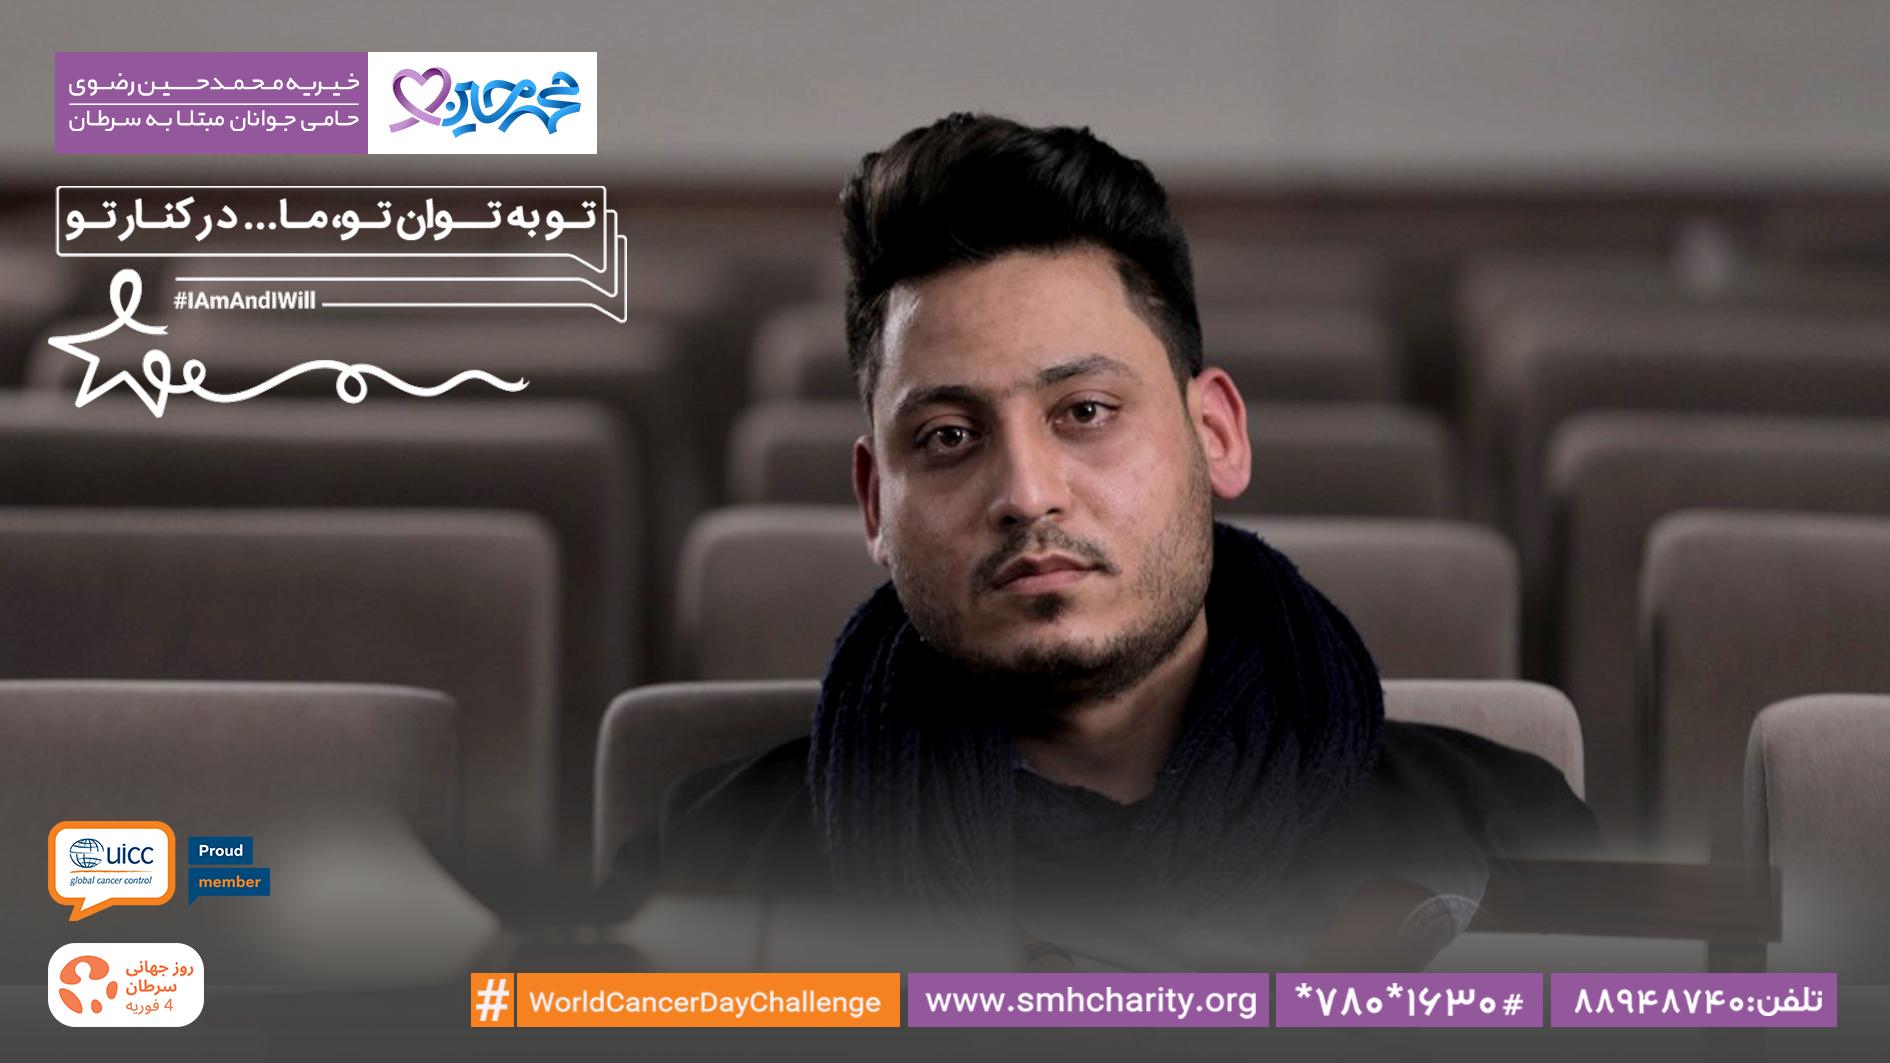 محمدجواد، پنجمین قهرمان کمپین تو_به_توان_تو